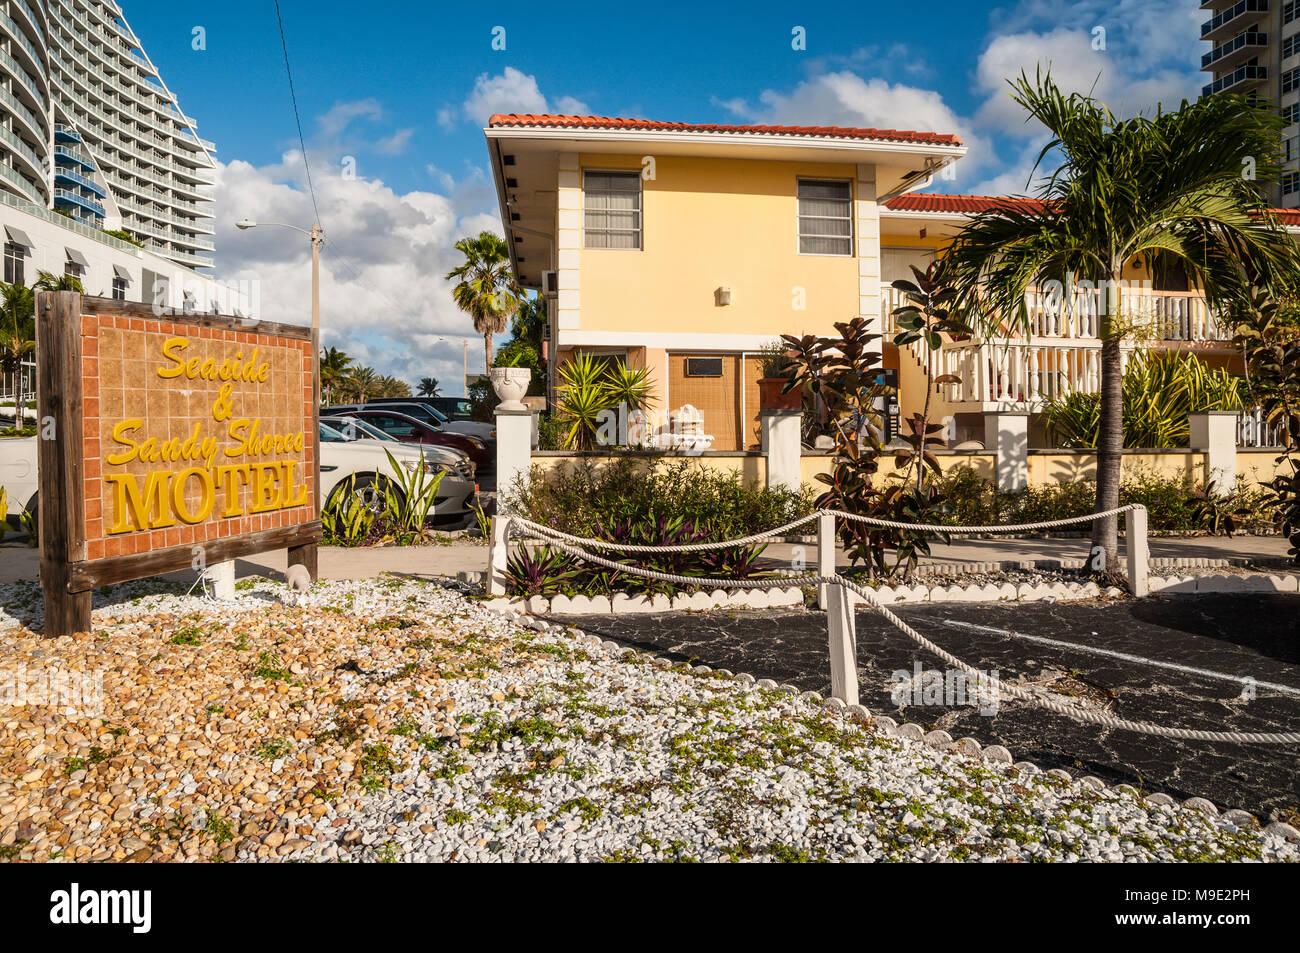 Sky Motel Fort Lauderdale Florida